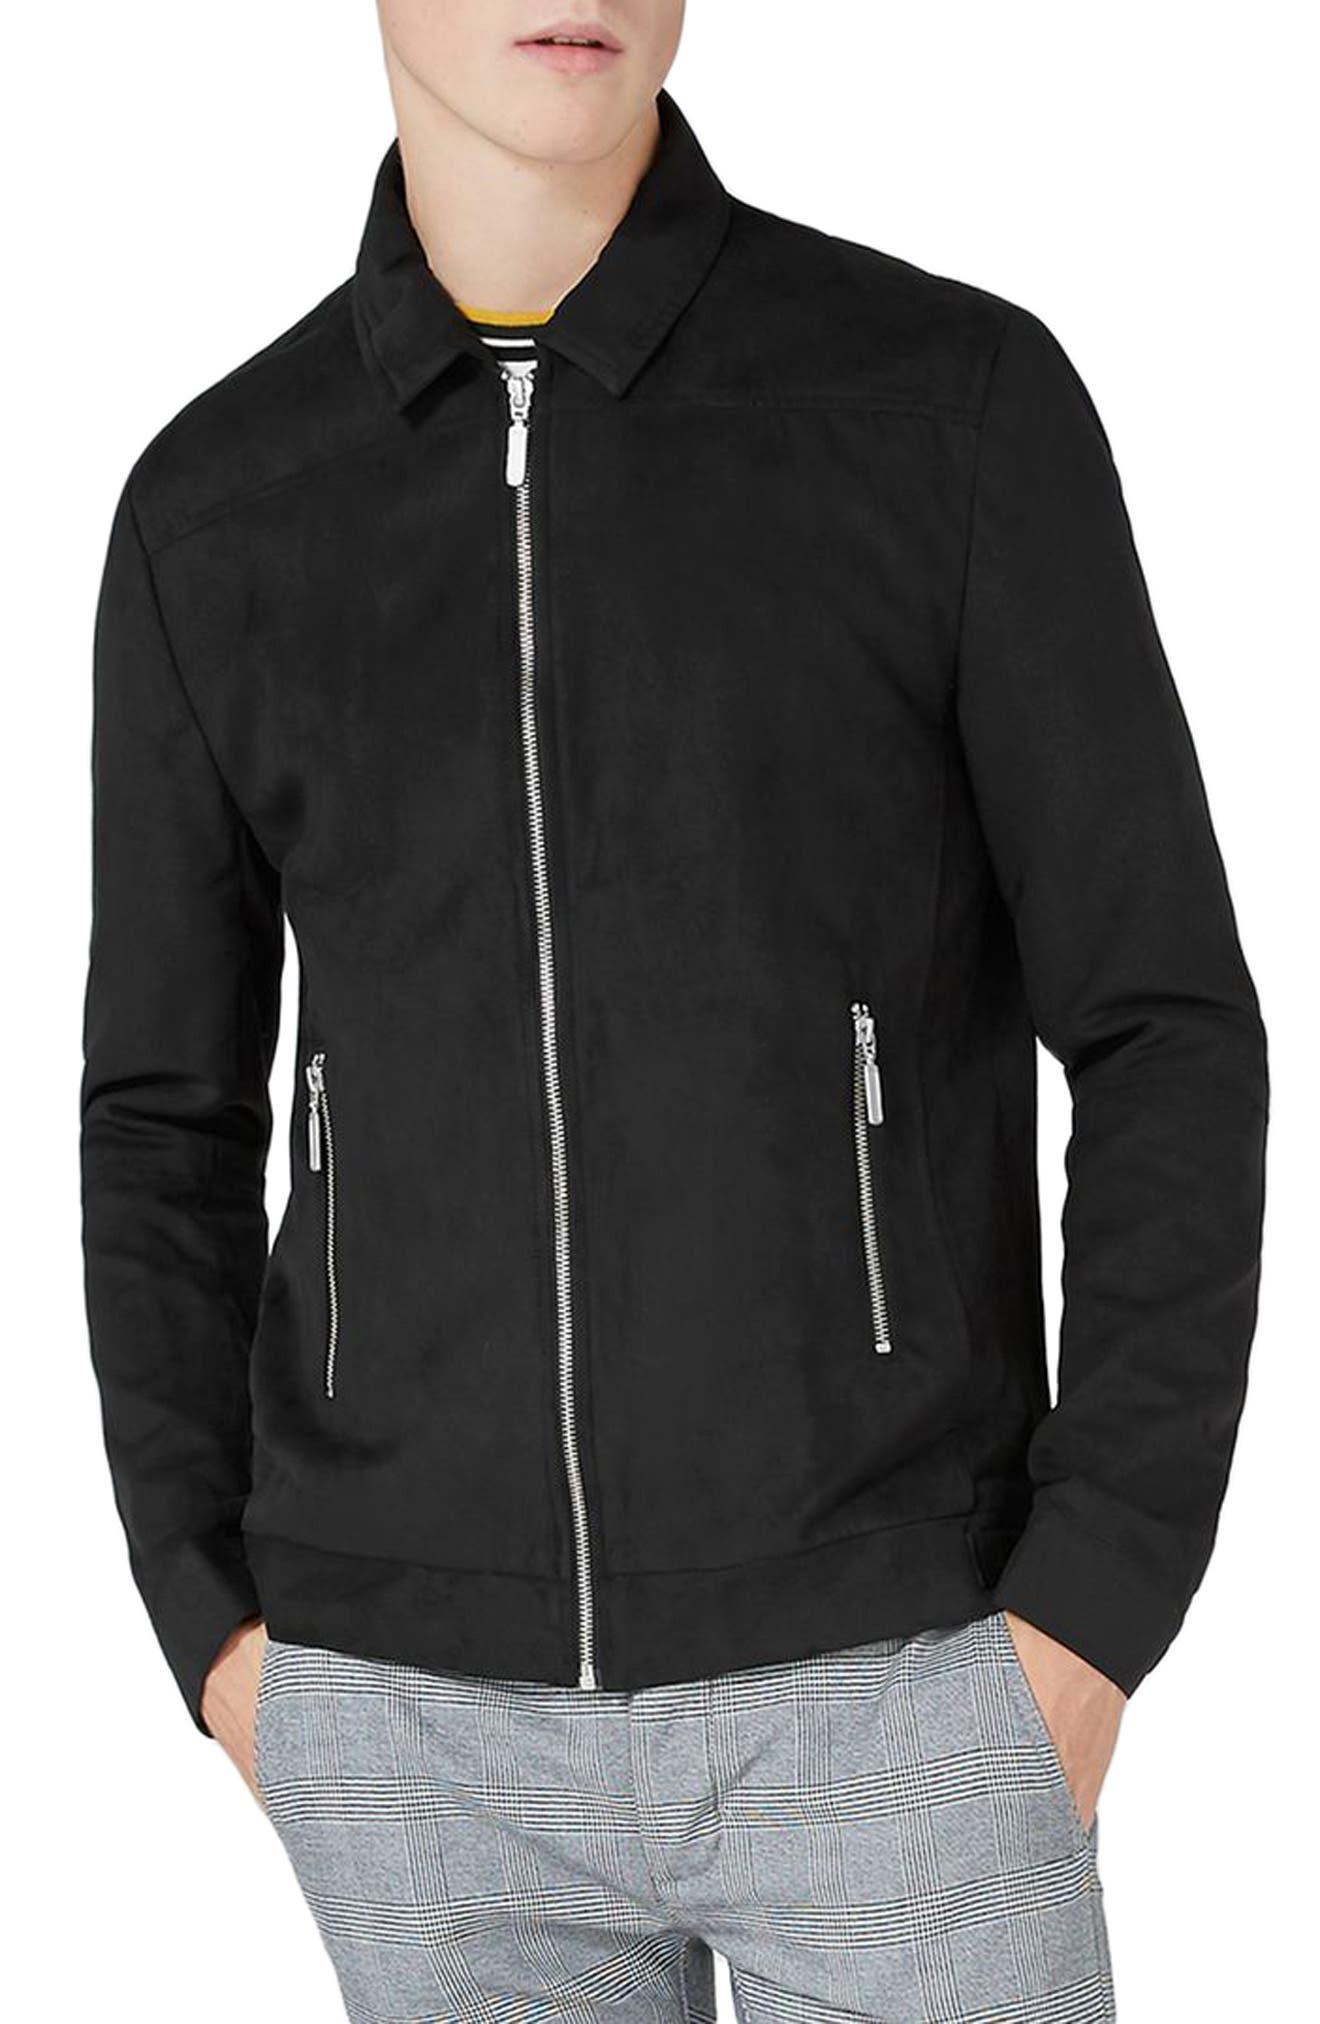 Alternate Image 1 Selected - Topman Harrington Jacket